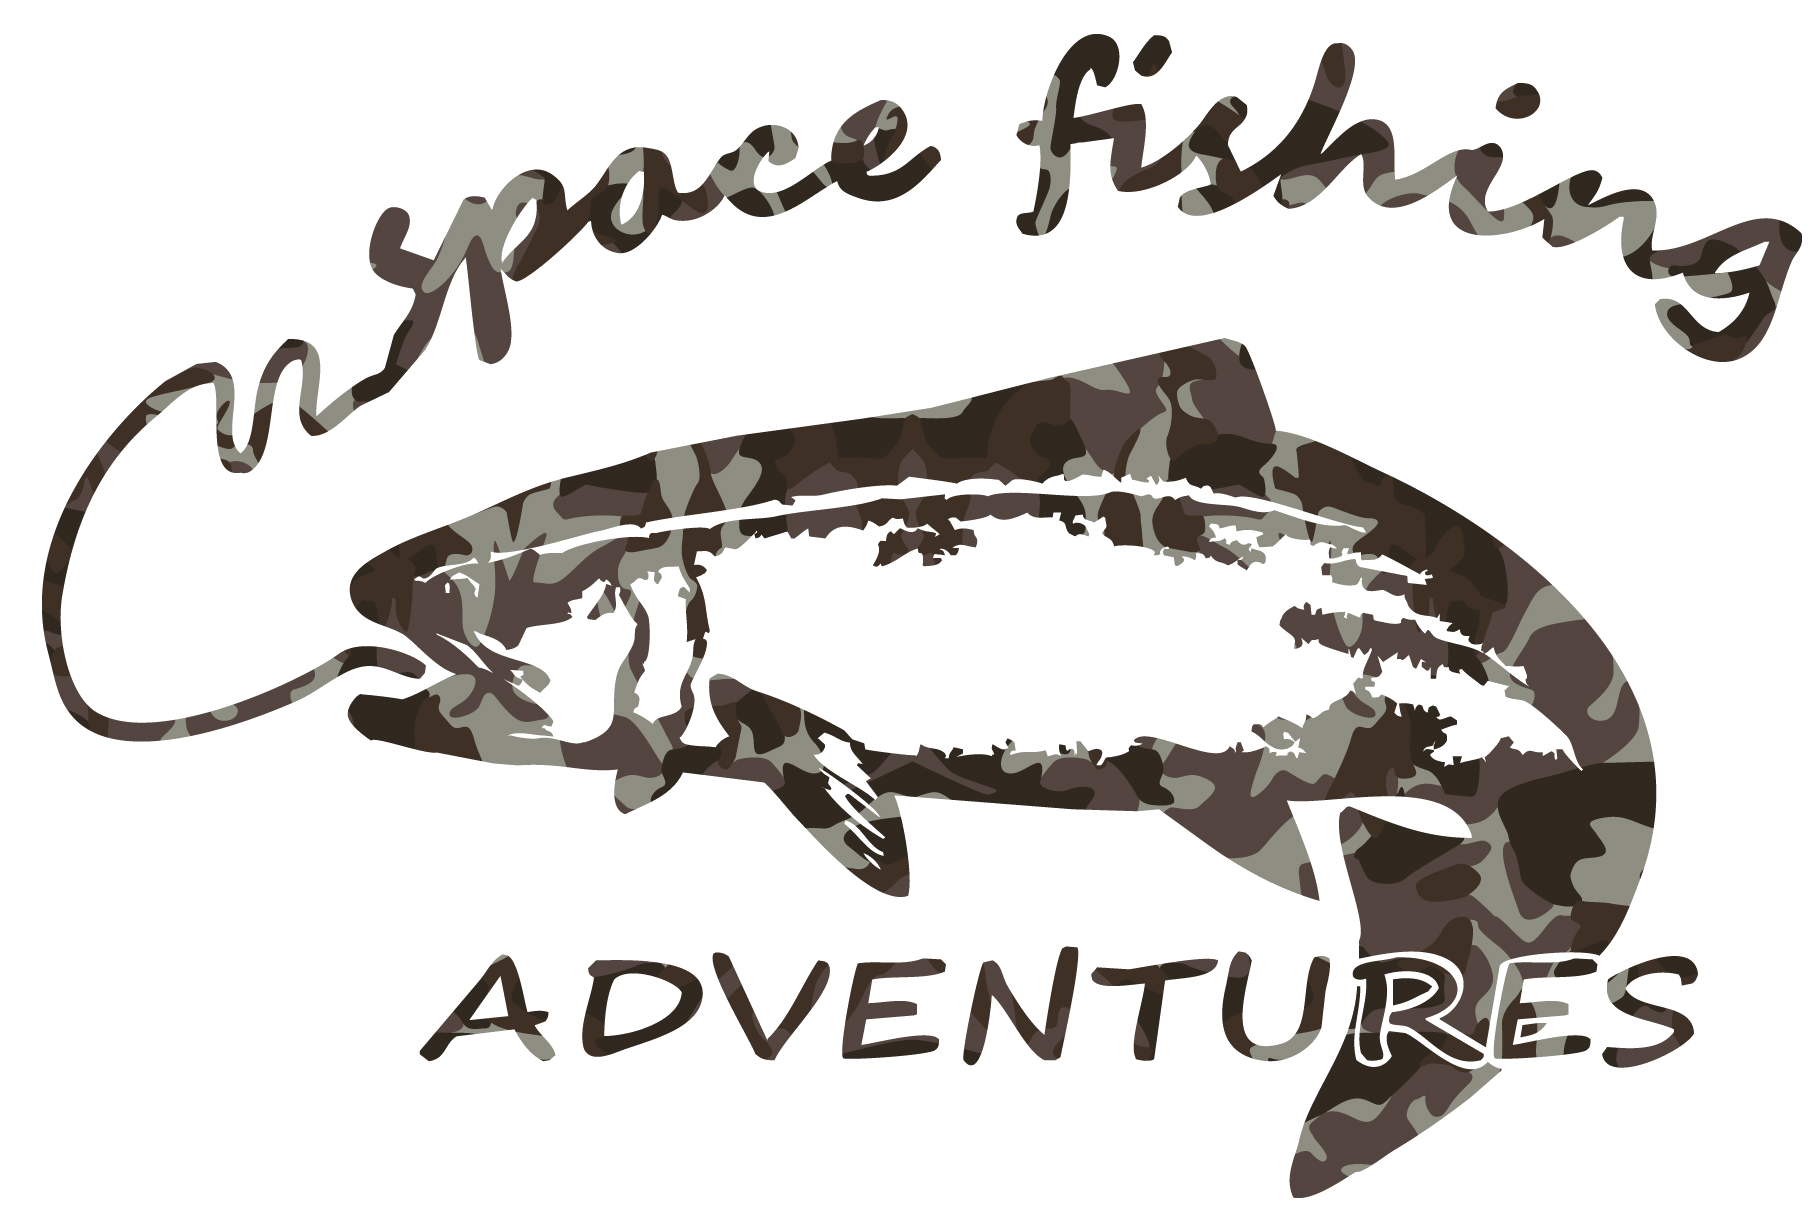 Spacefishing adventures